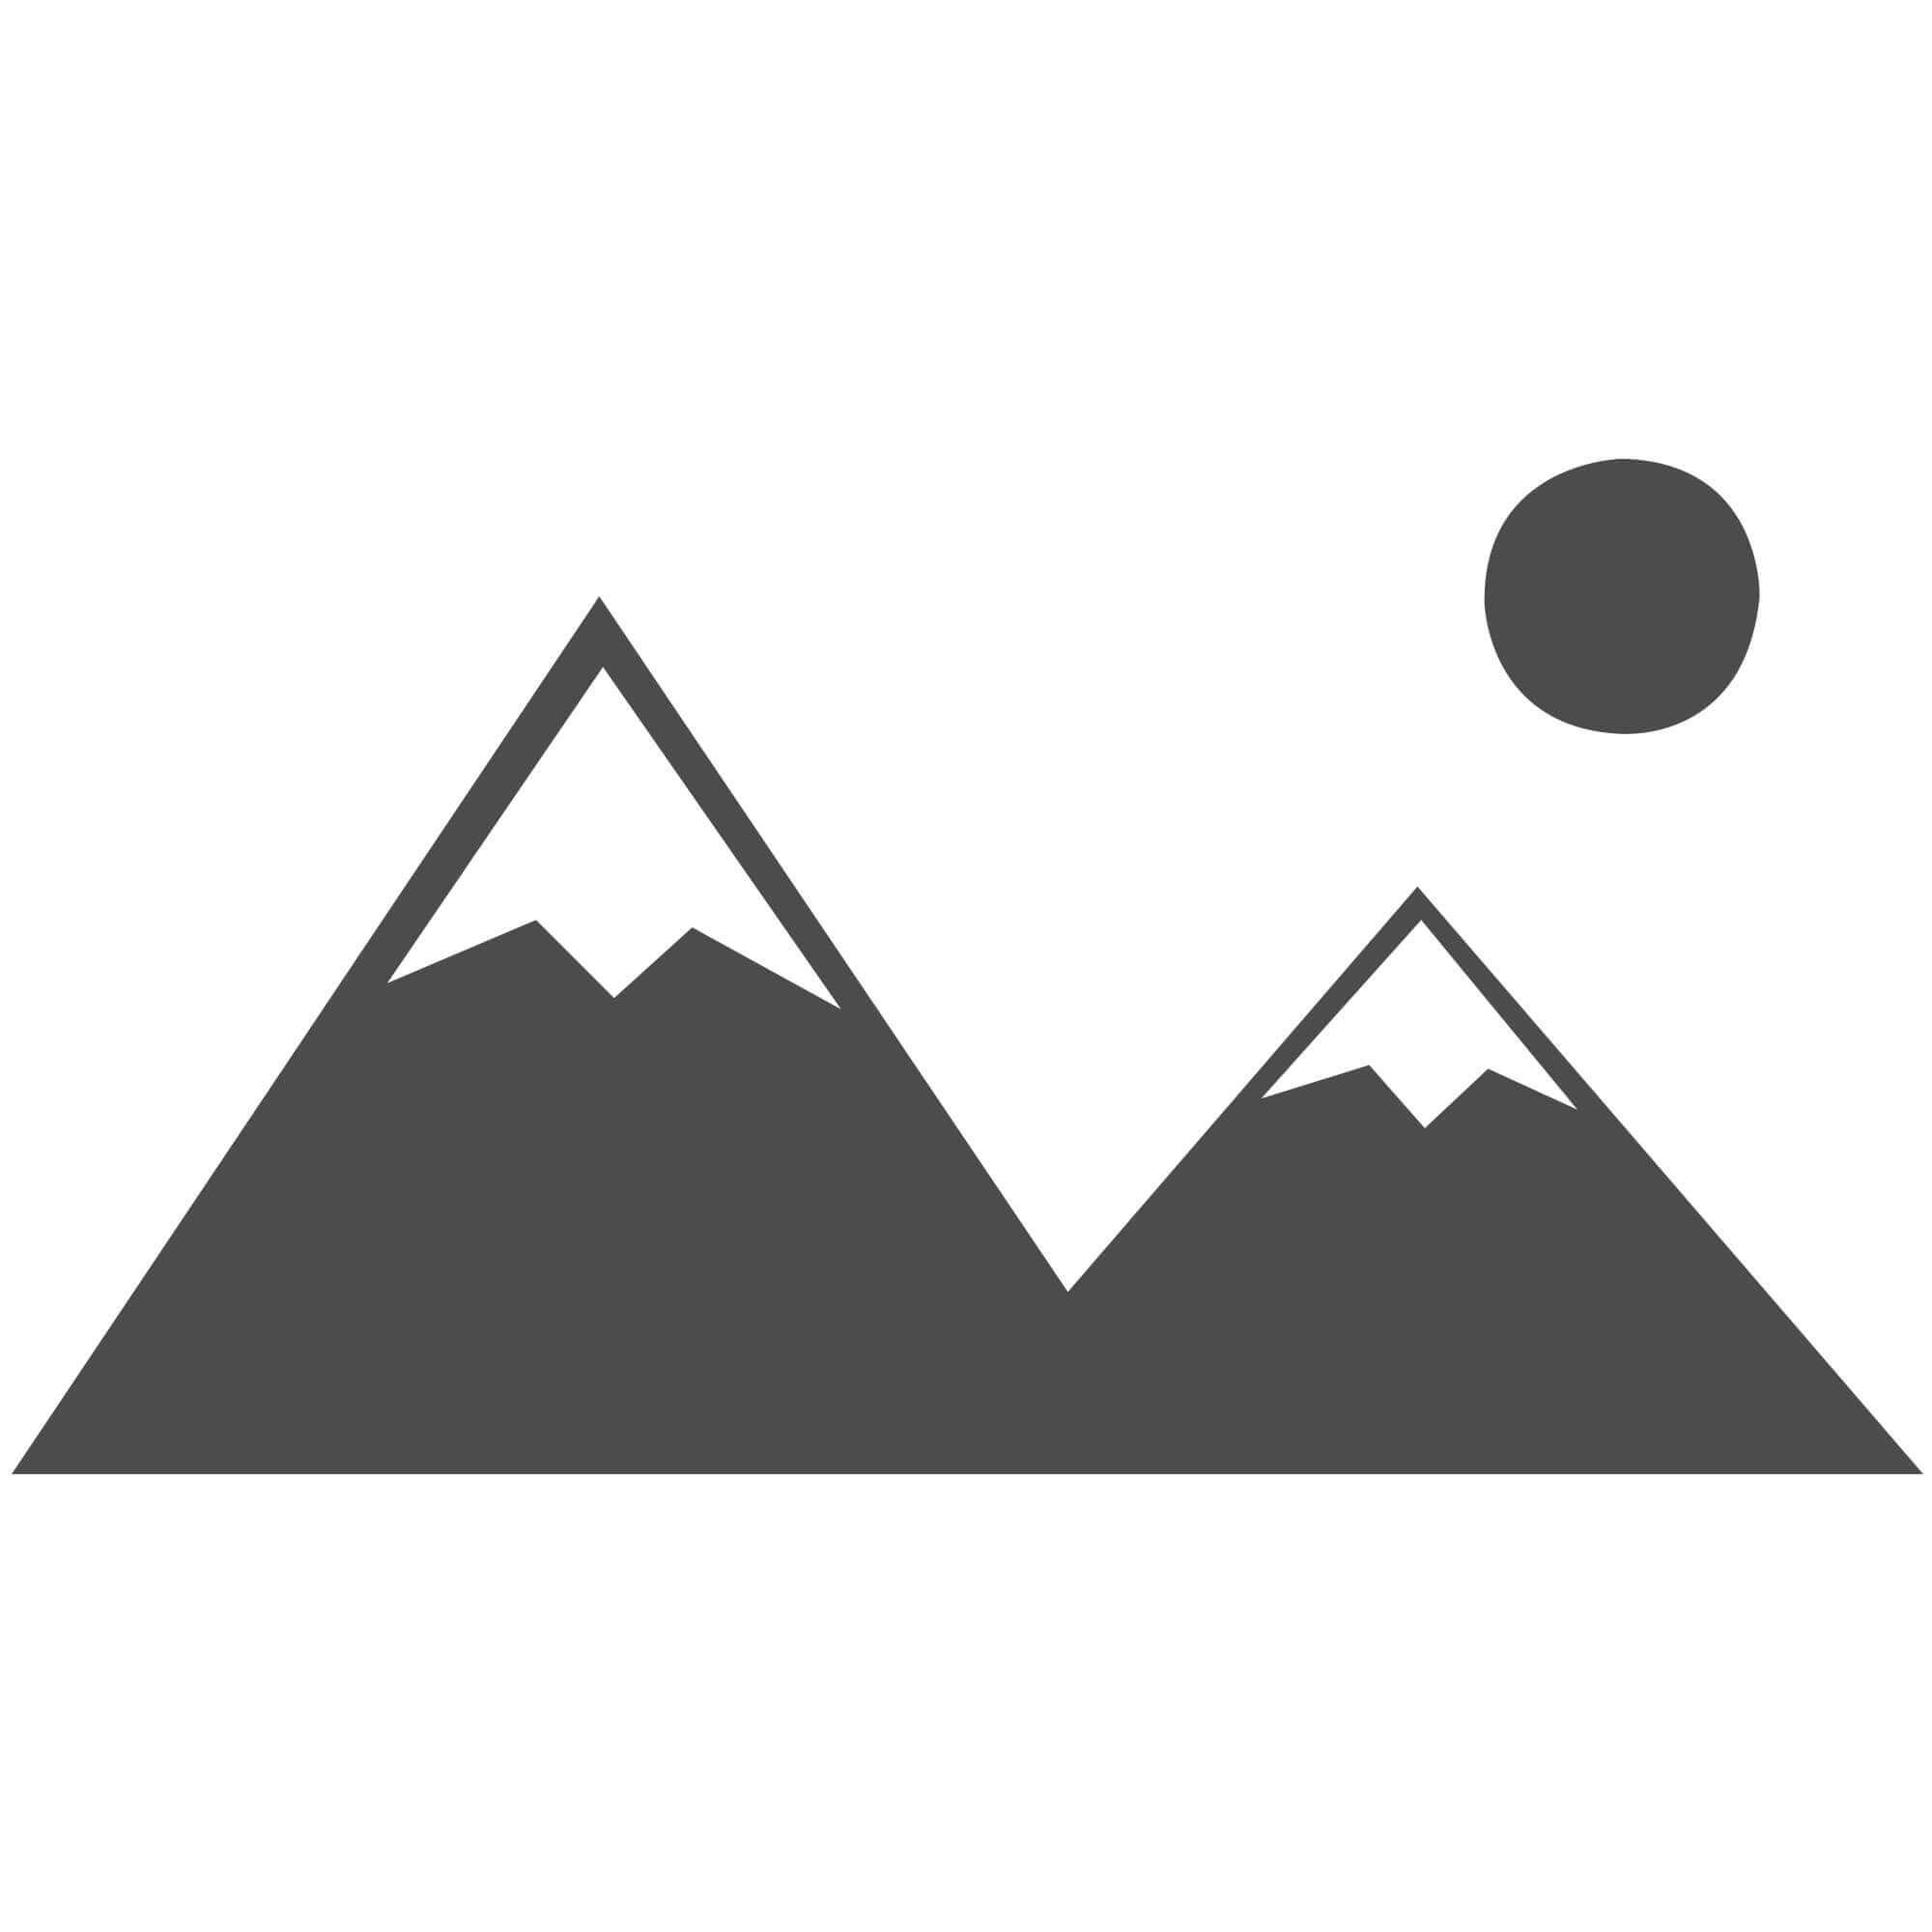 Persian Shiraz Tribal Wool Rug - 165 x 238 cm